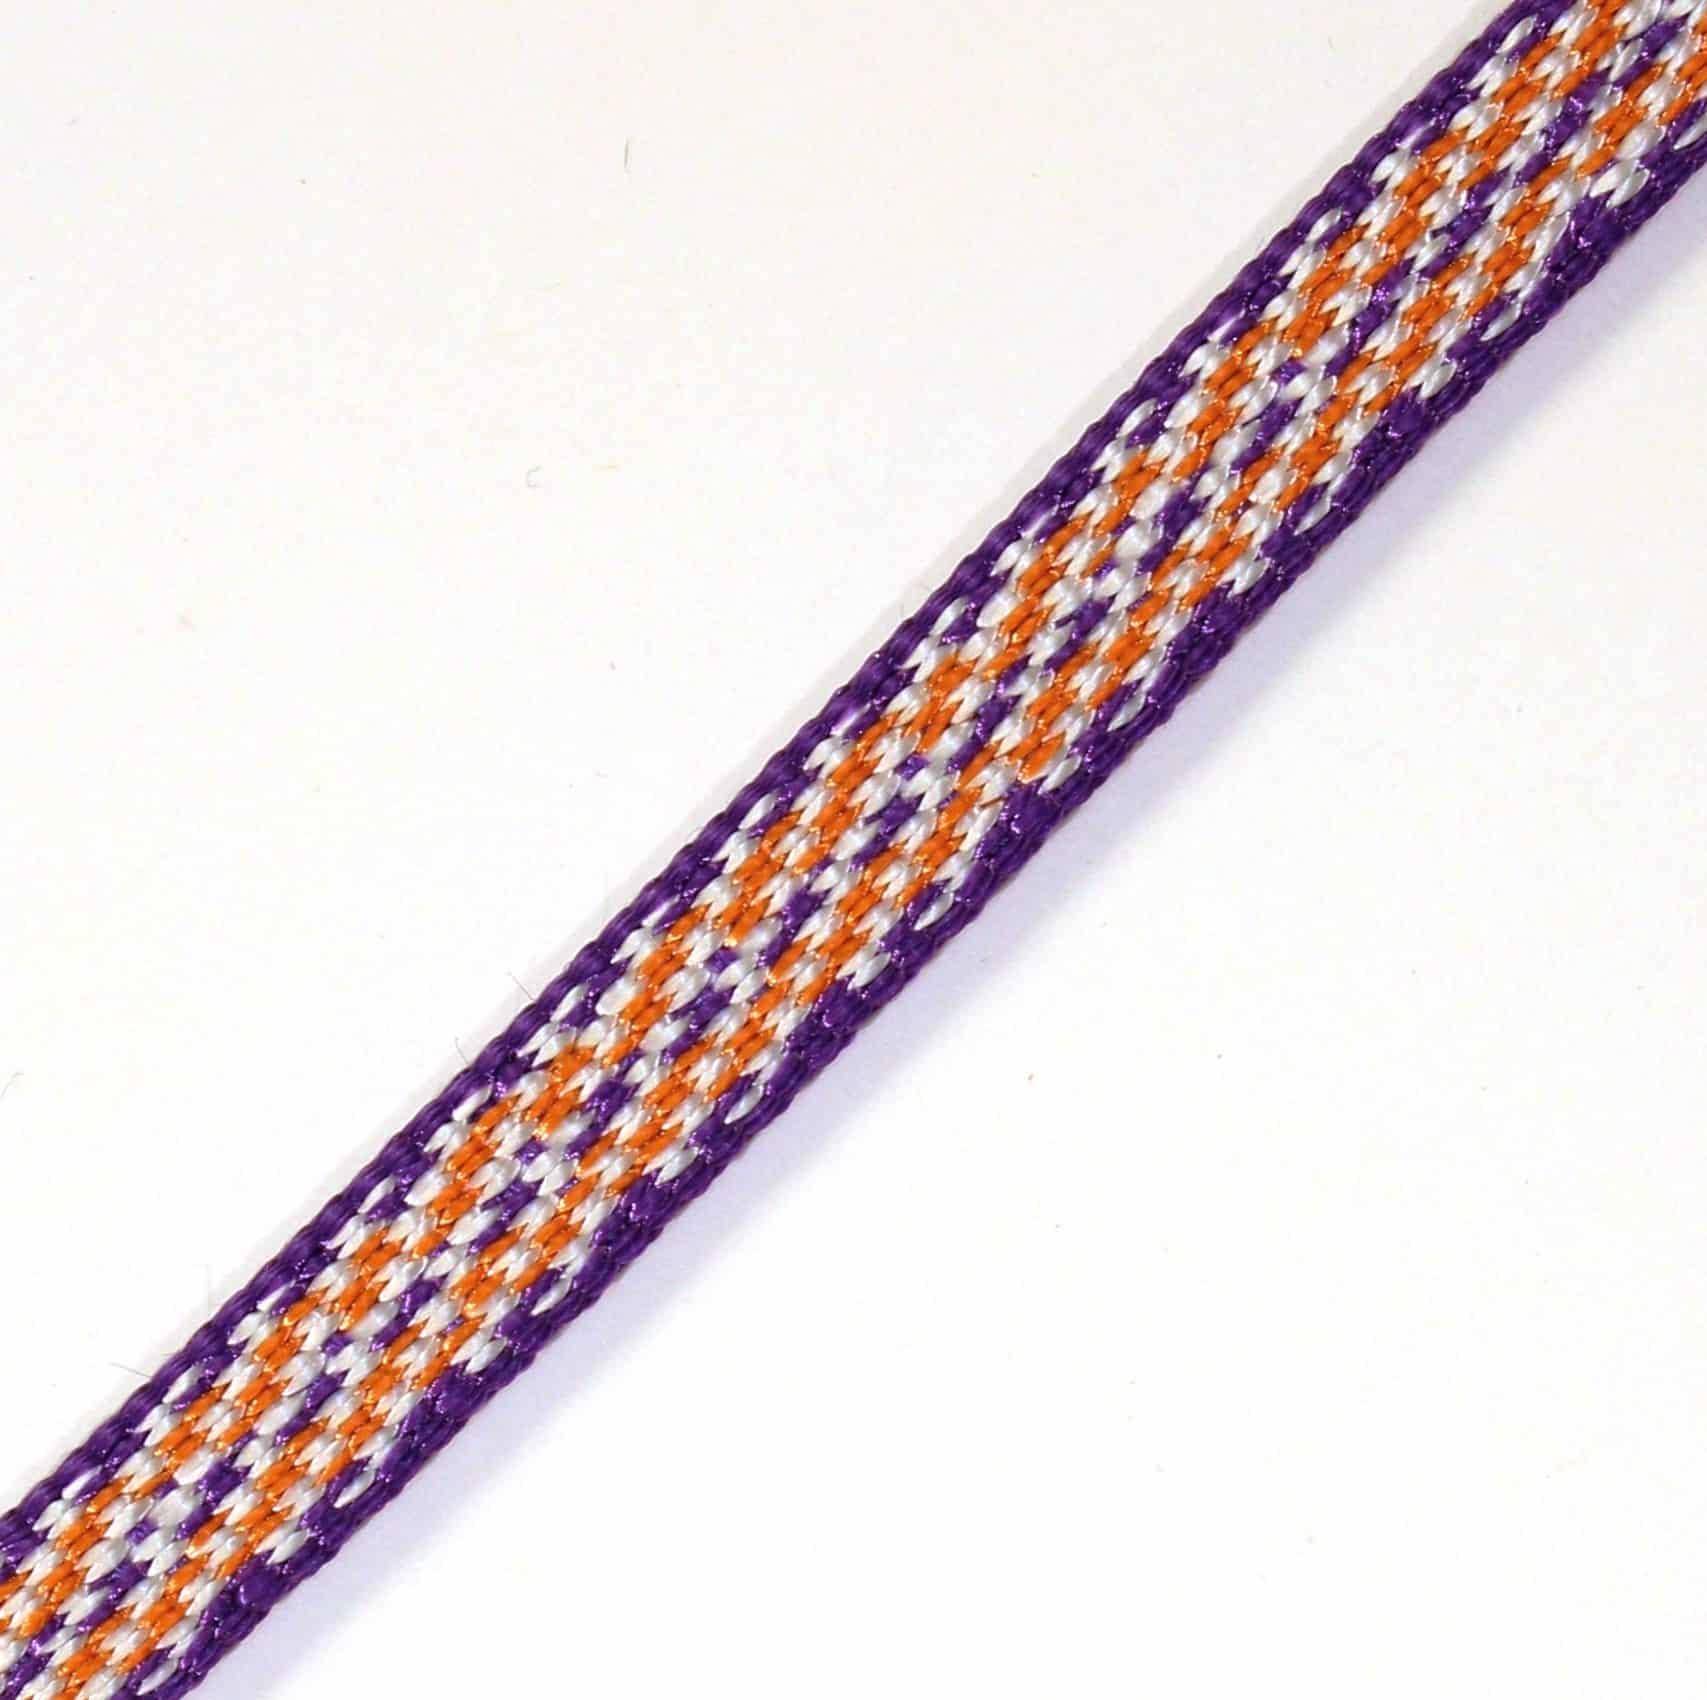 11.4mm Textured Nylon Webbing with Dyneema® Interior